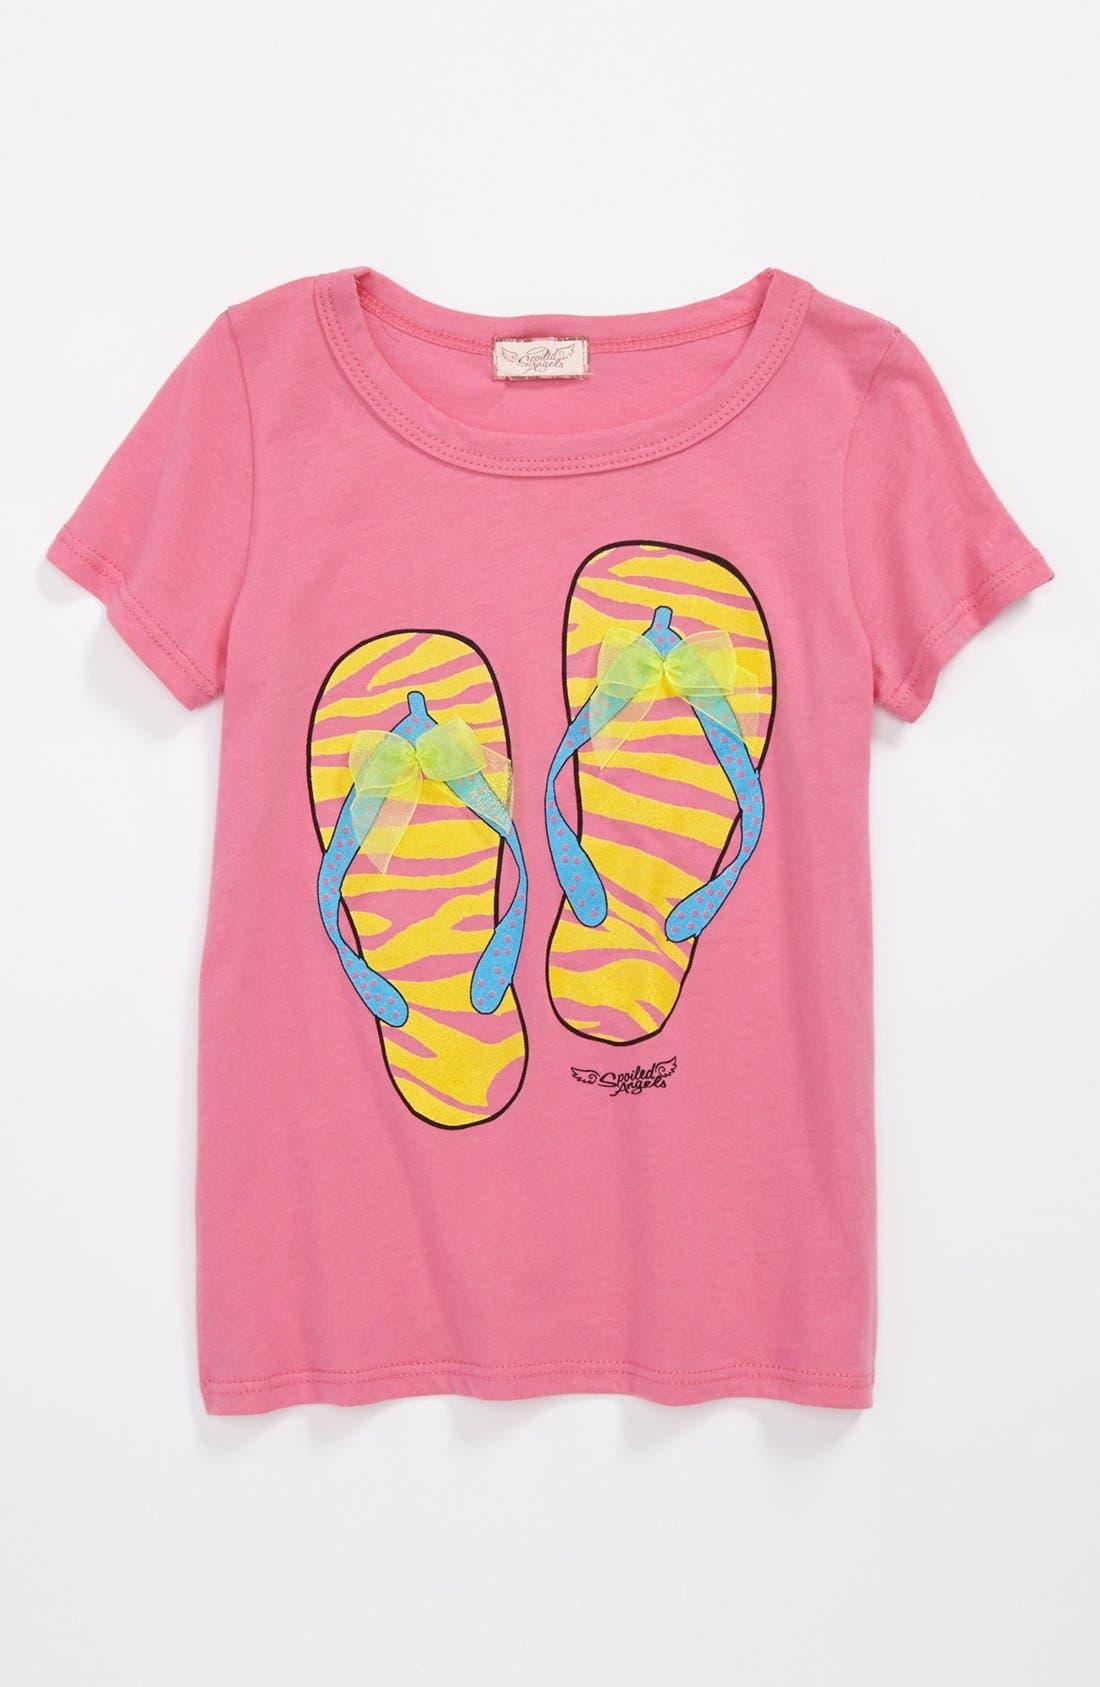 Main Image - Spoiled Angels 'Flip Flop' Tee (Toddler Girls)